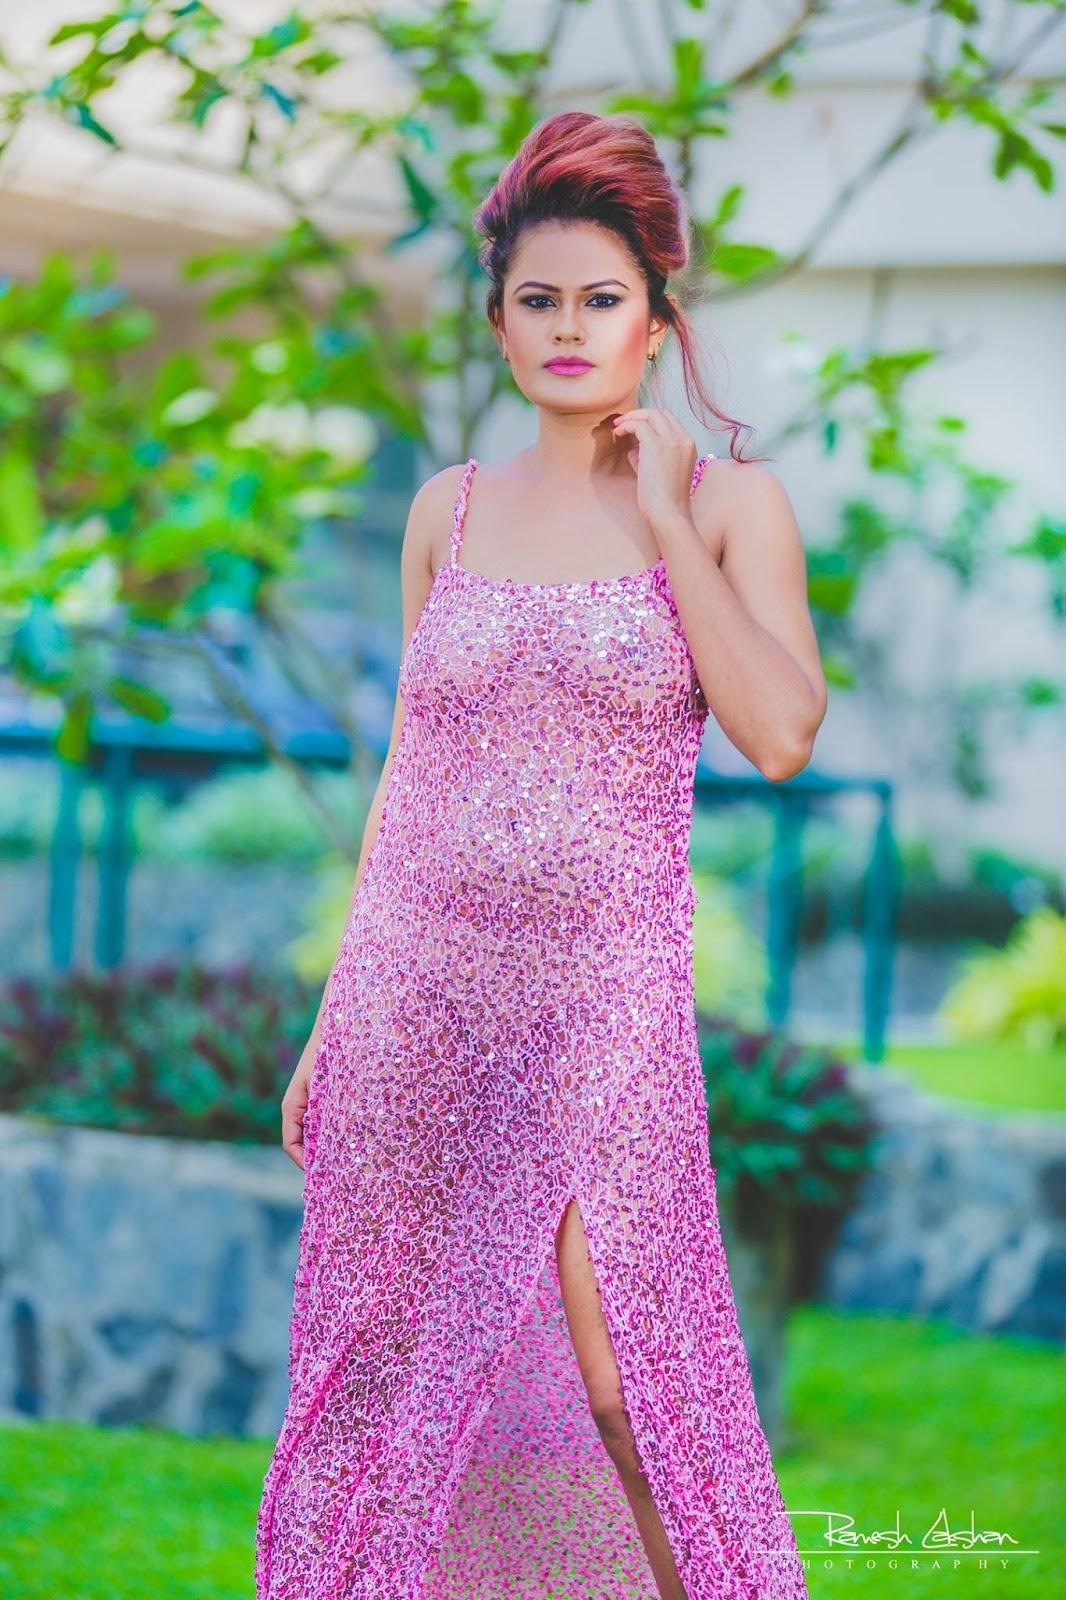 TamilCineStuff | : Upeksha Swarnamali hot and seductive photos Hot Girls are one of the most